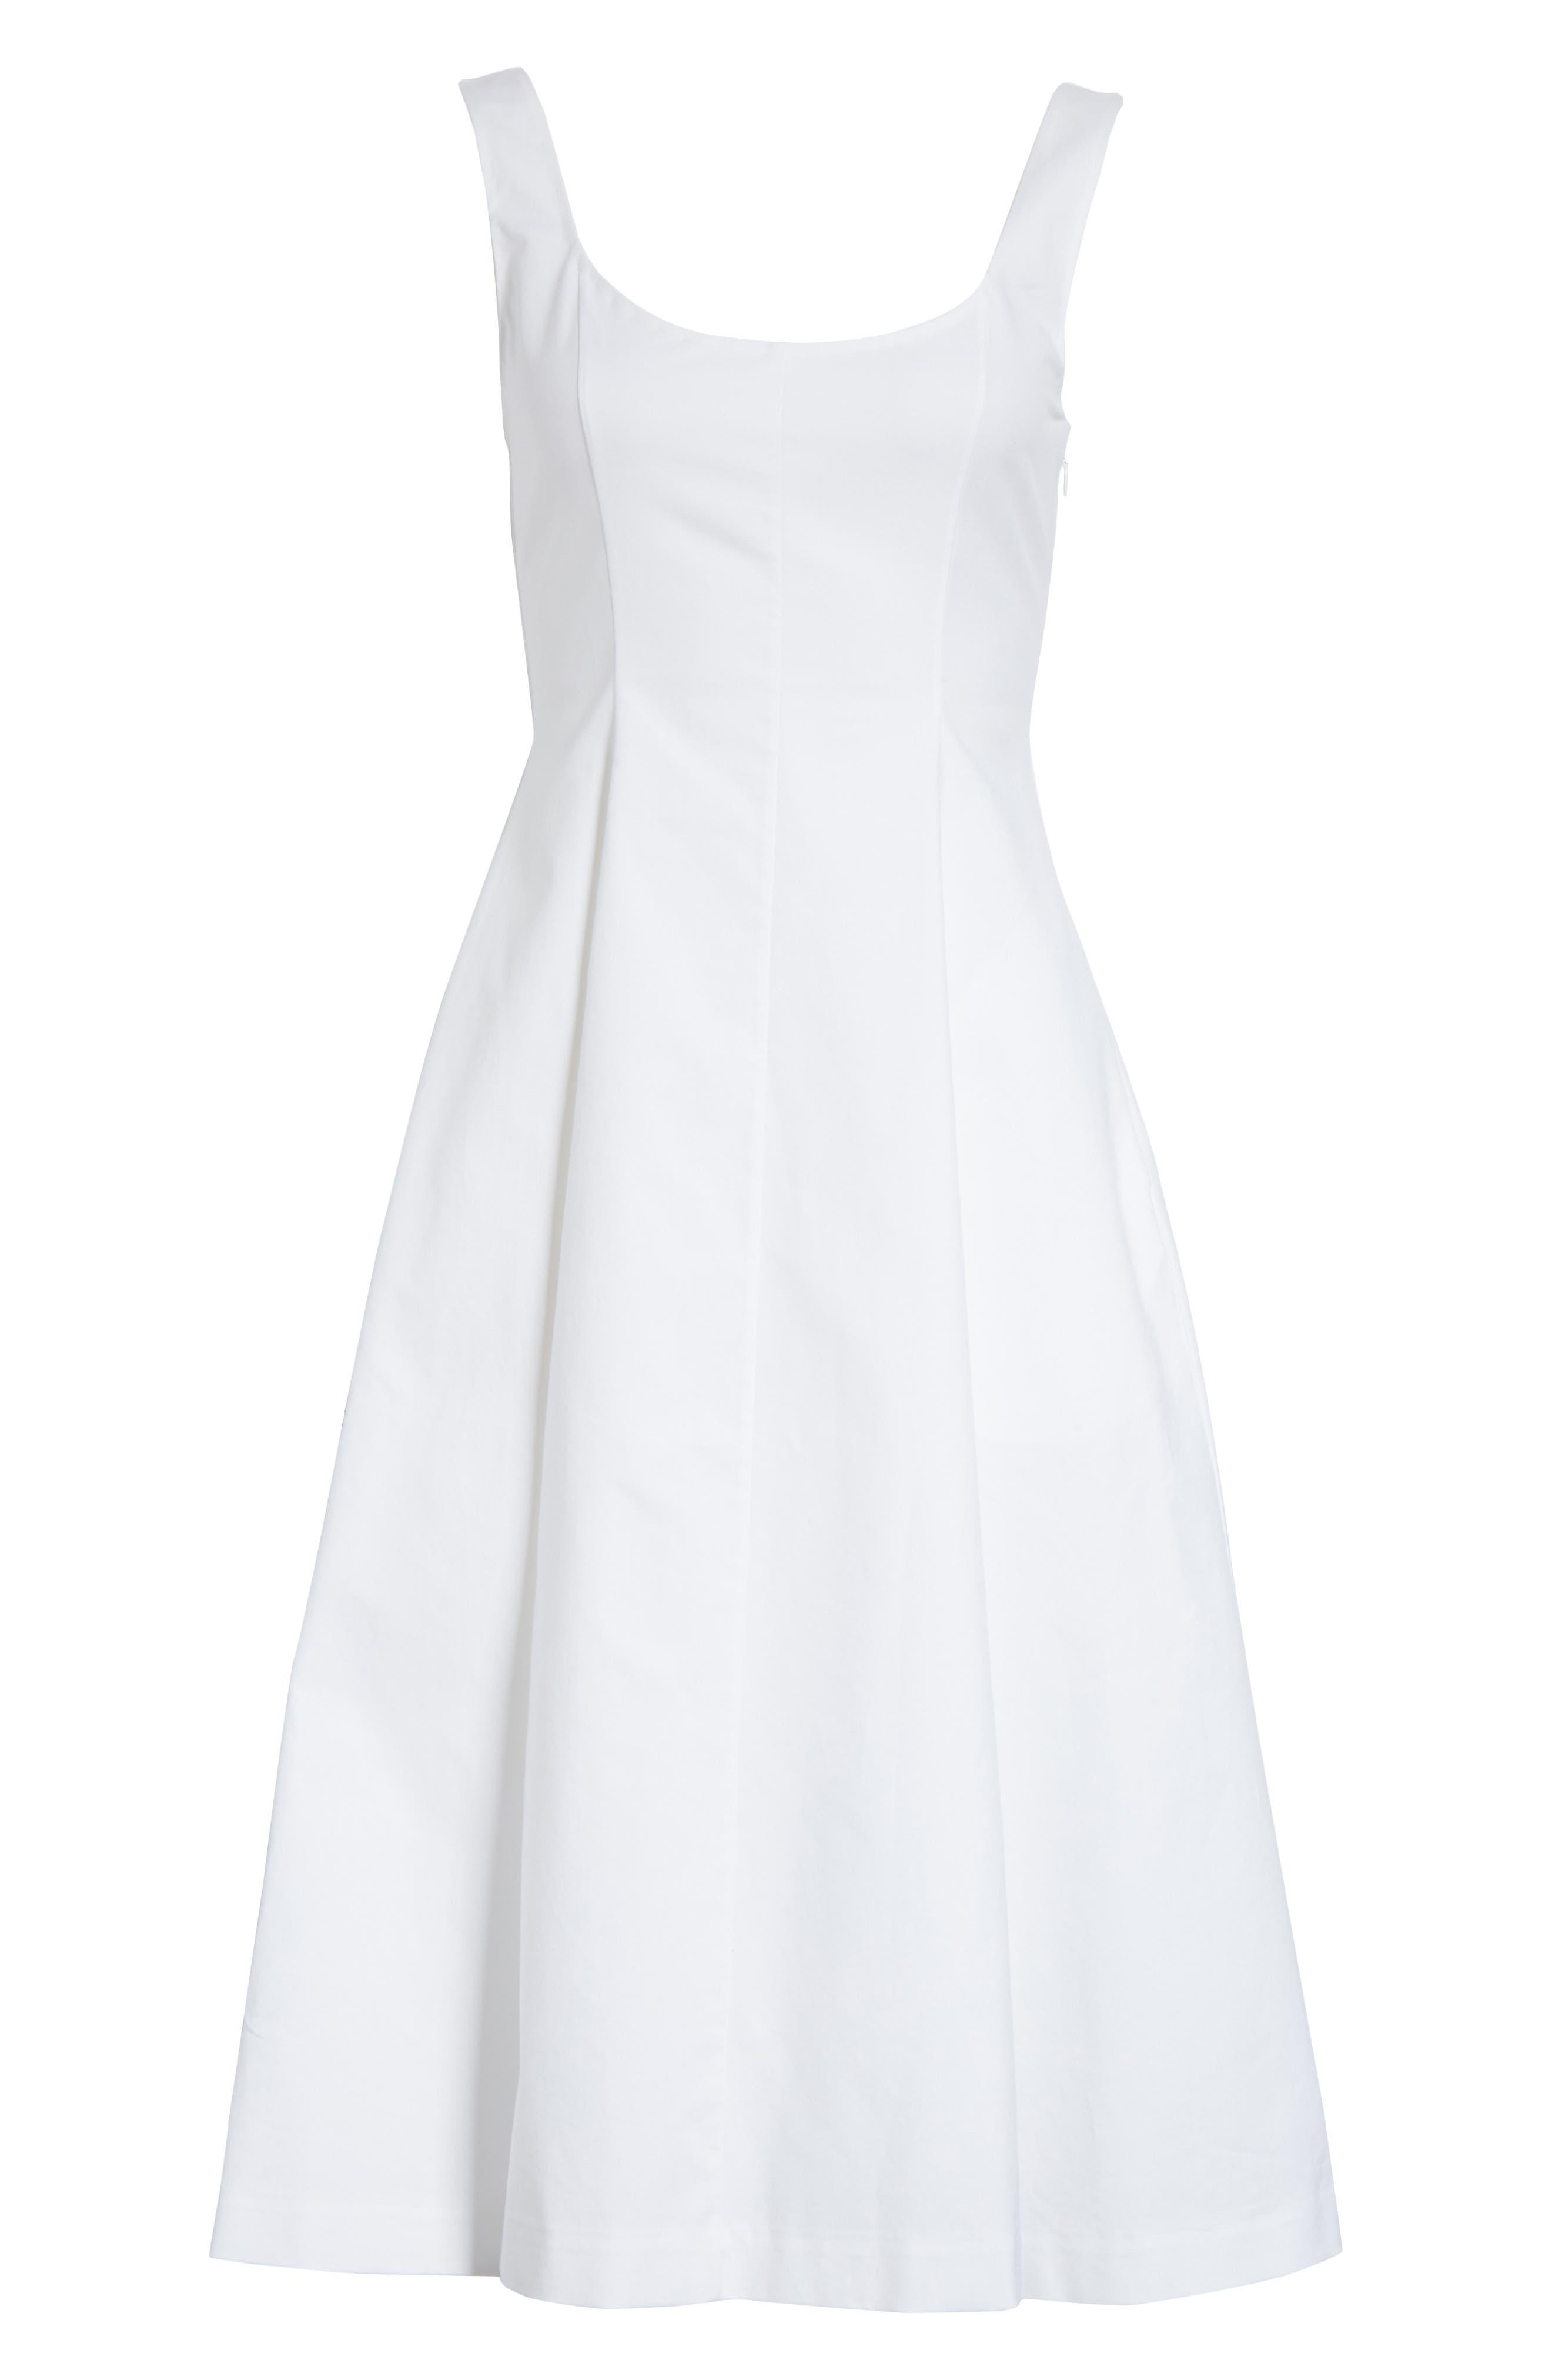 Cindy Poplin Tank Dress,                             Alternate thumbnail 7, color,                             White